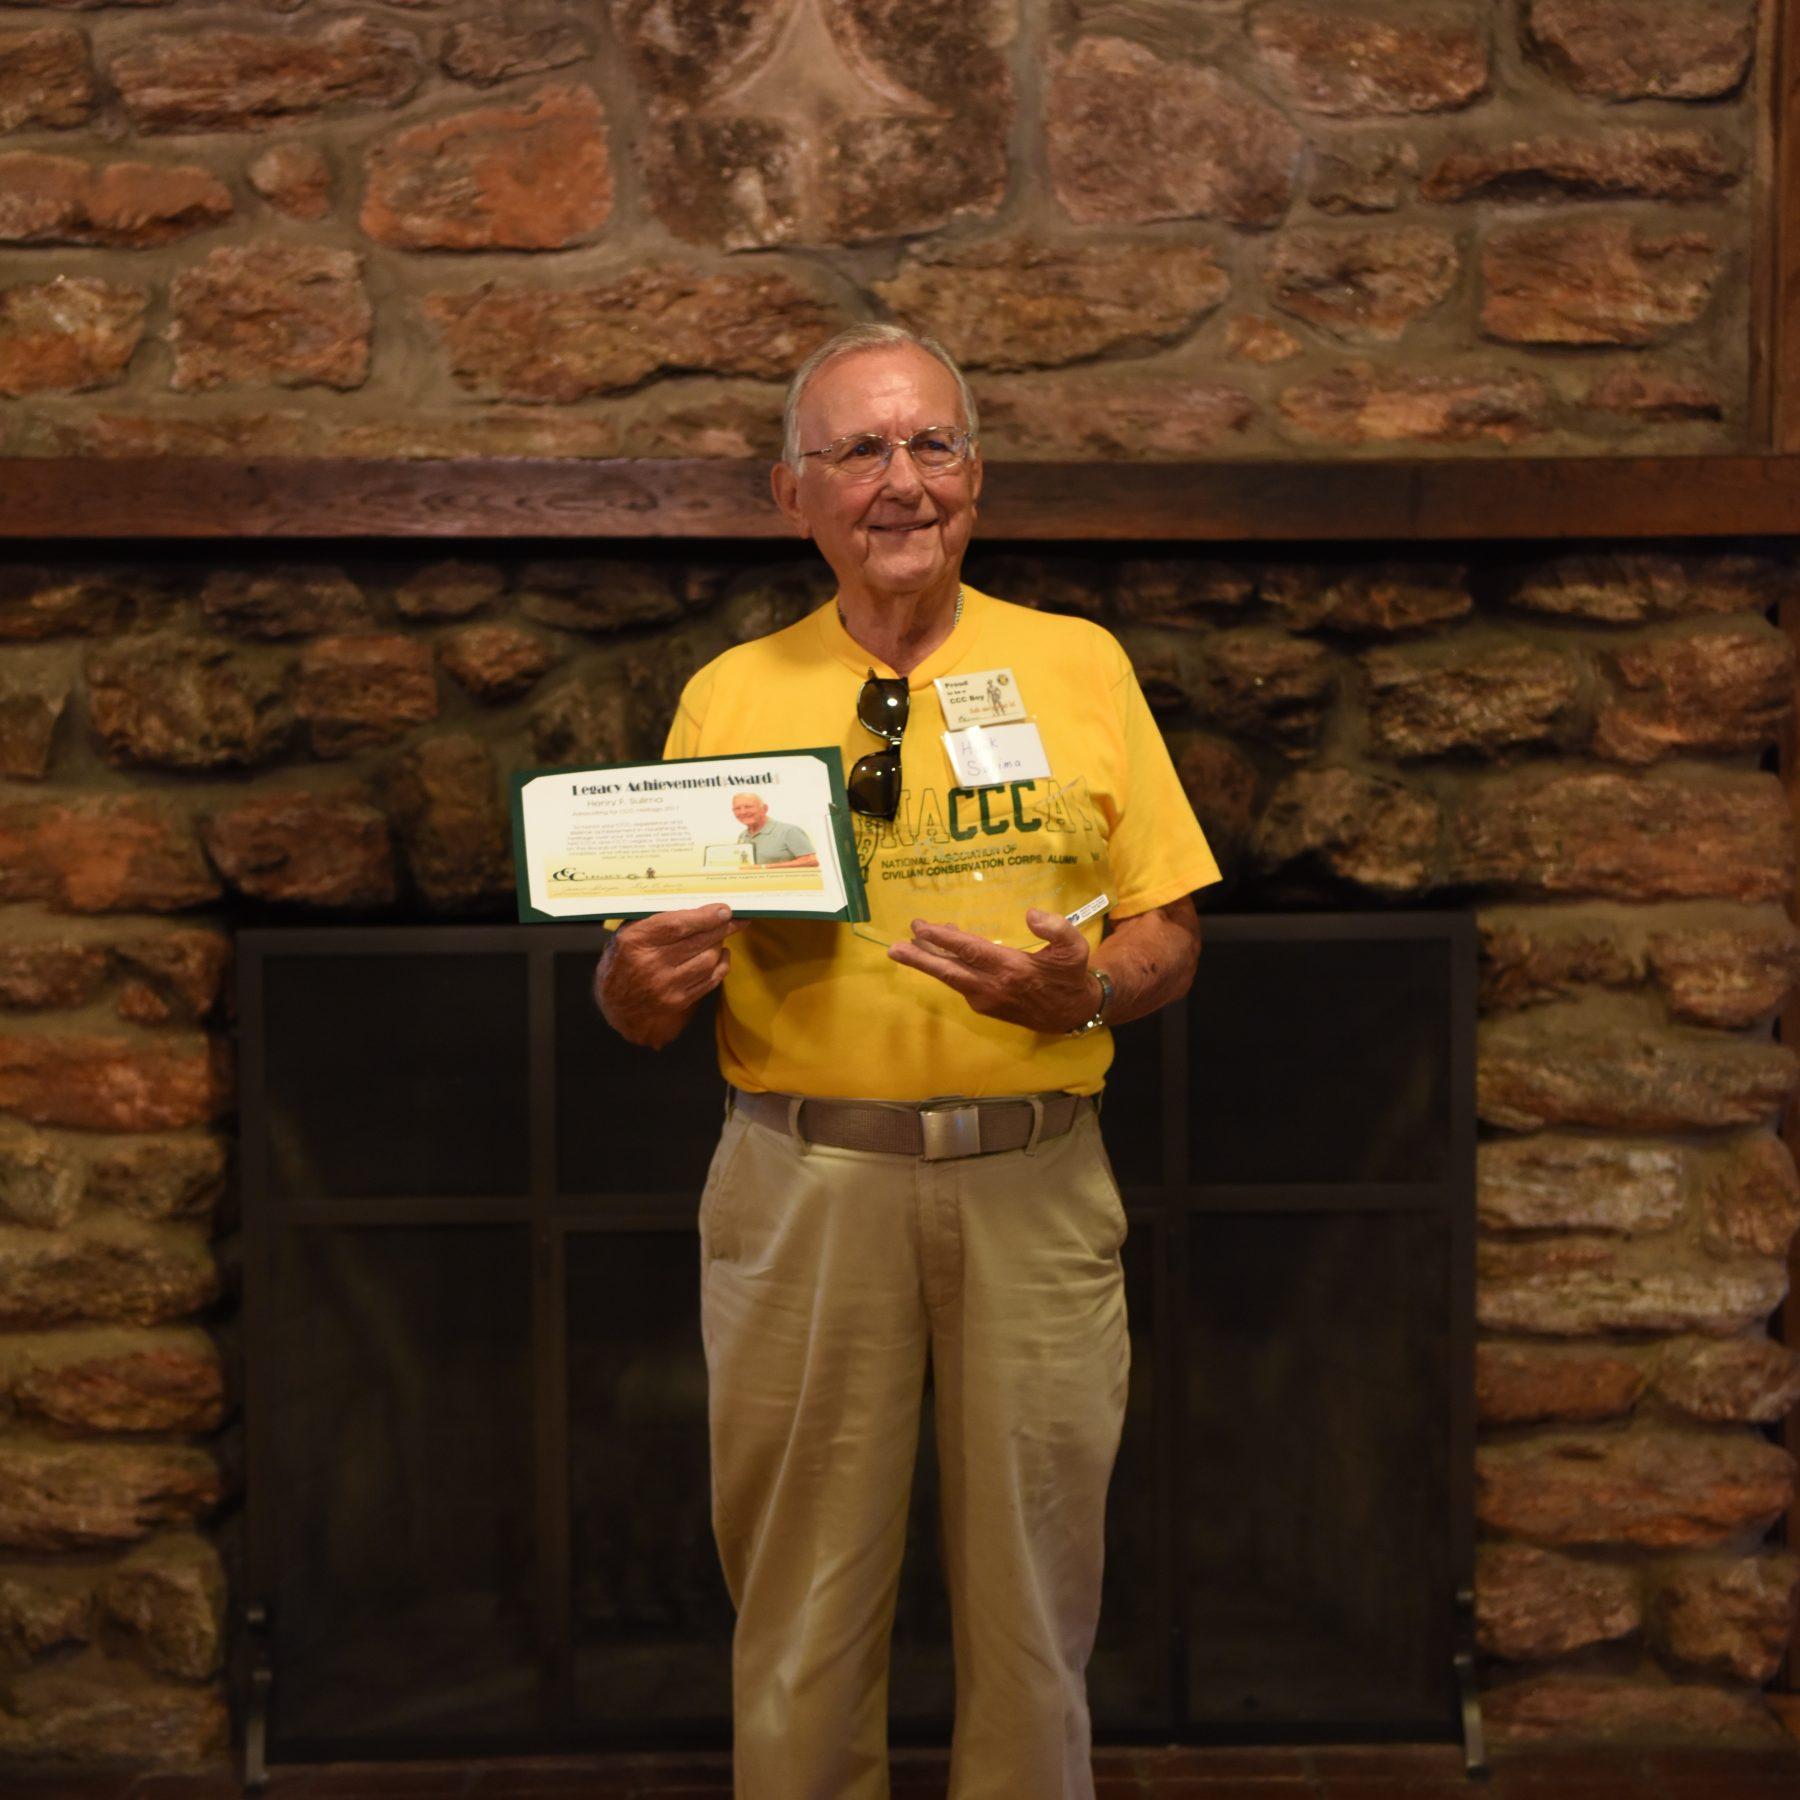 Henry Sulima, Life Achievement Award